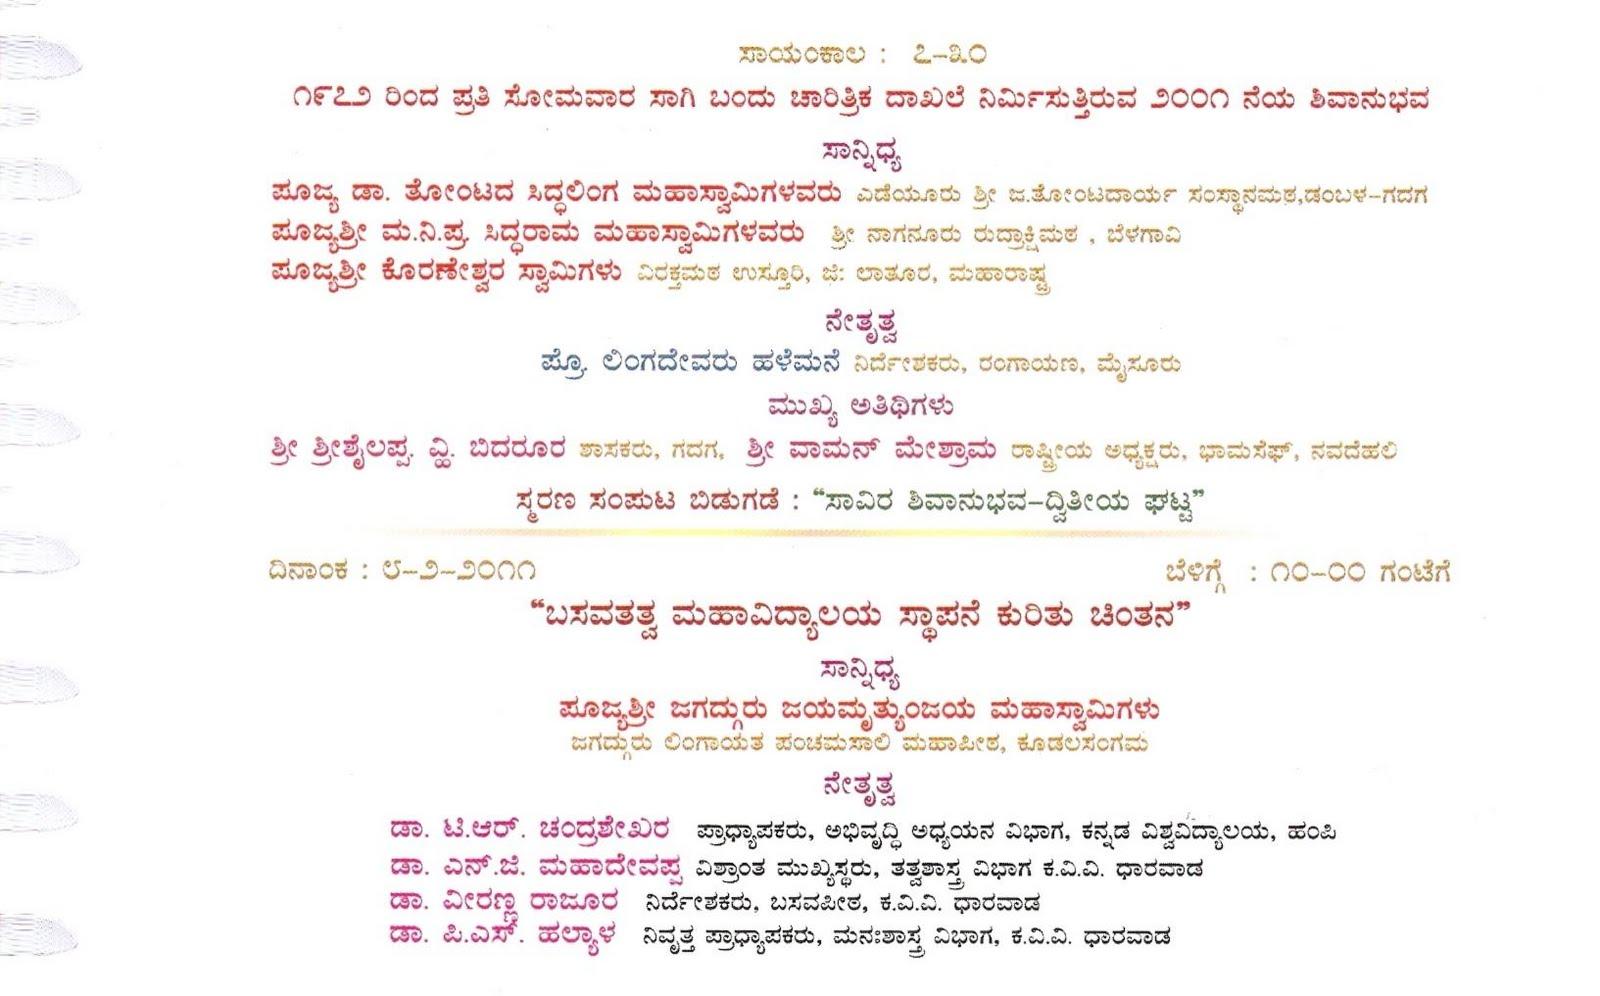 Ambedkar action alert fwd bamcef jtmath 2001 shivanubhava fwd bamcef jtmath 2001 shivanubhava function invitation card stopboris Images